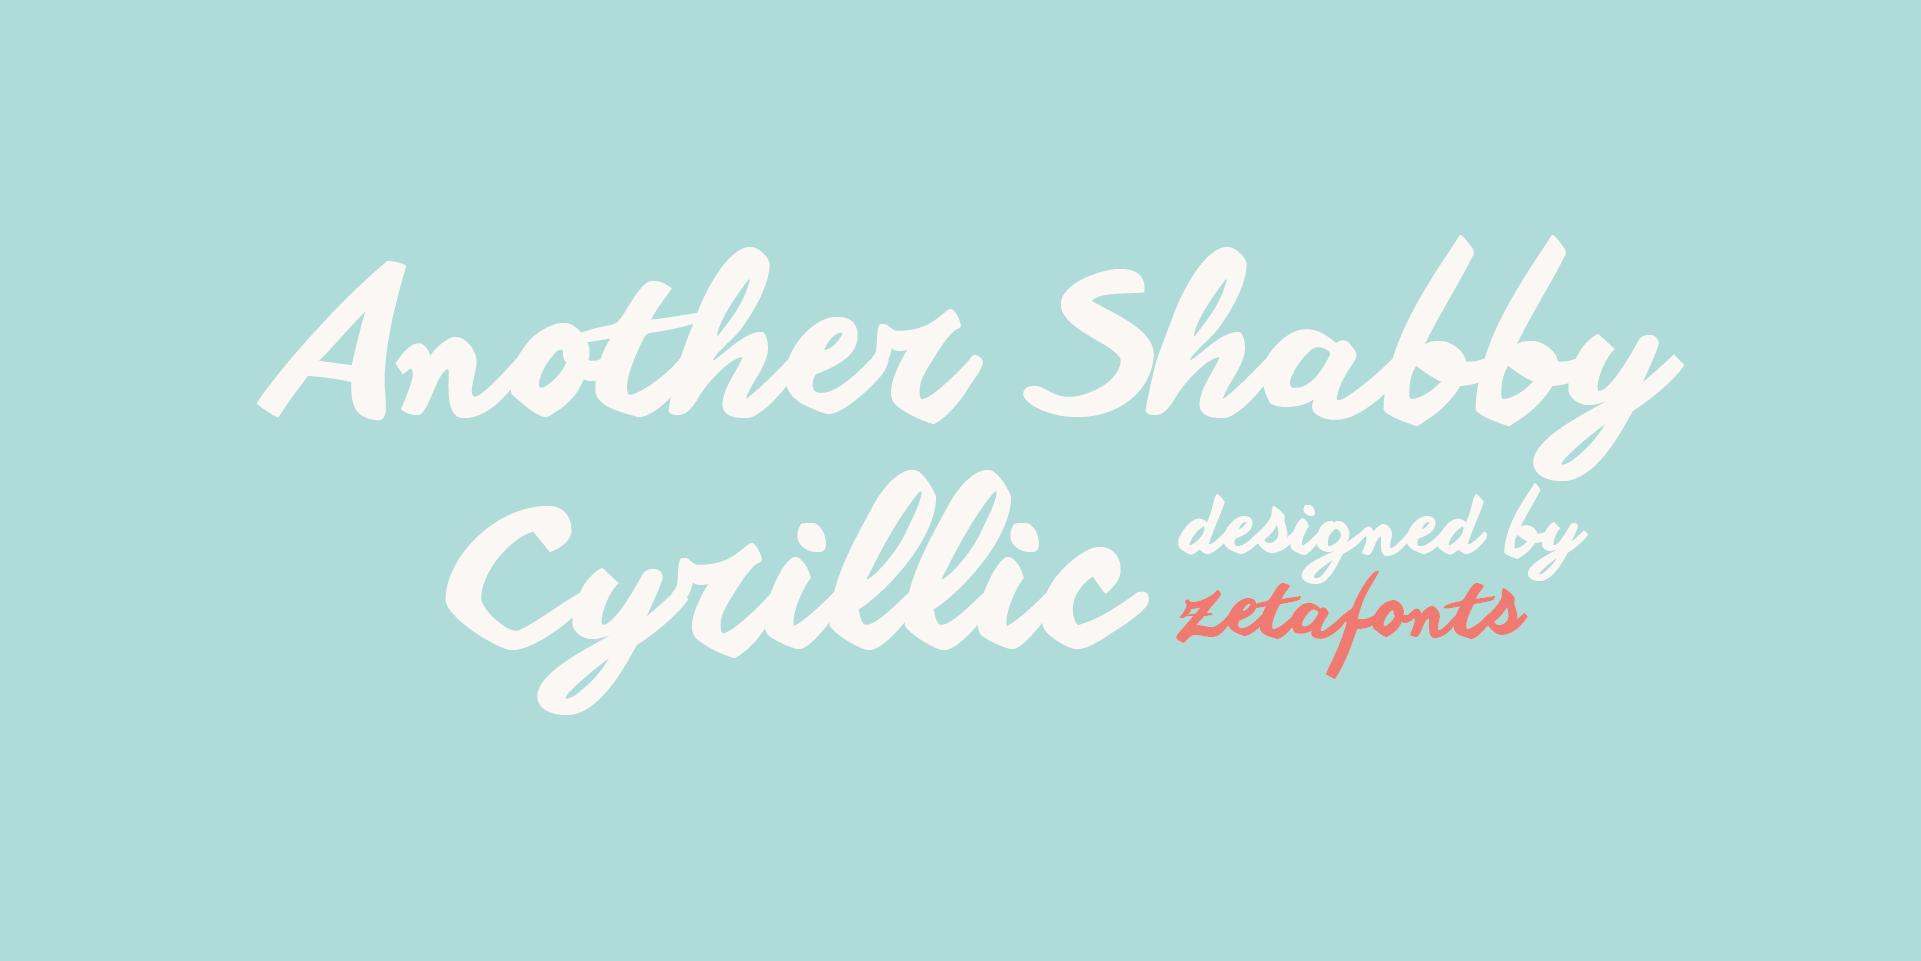 Another Shabby Cyrillic Typefacezetafonts